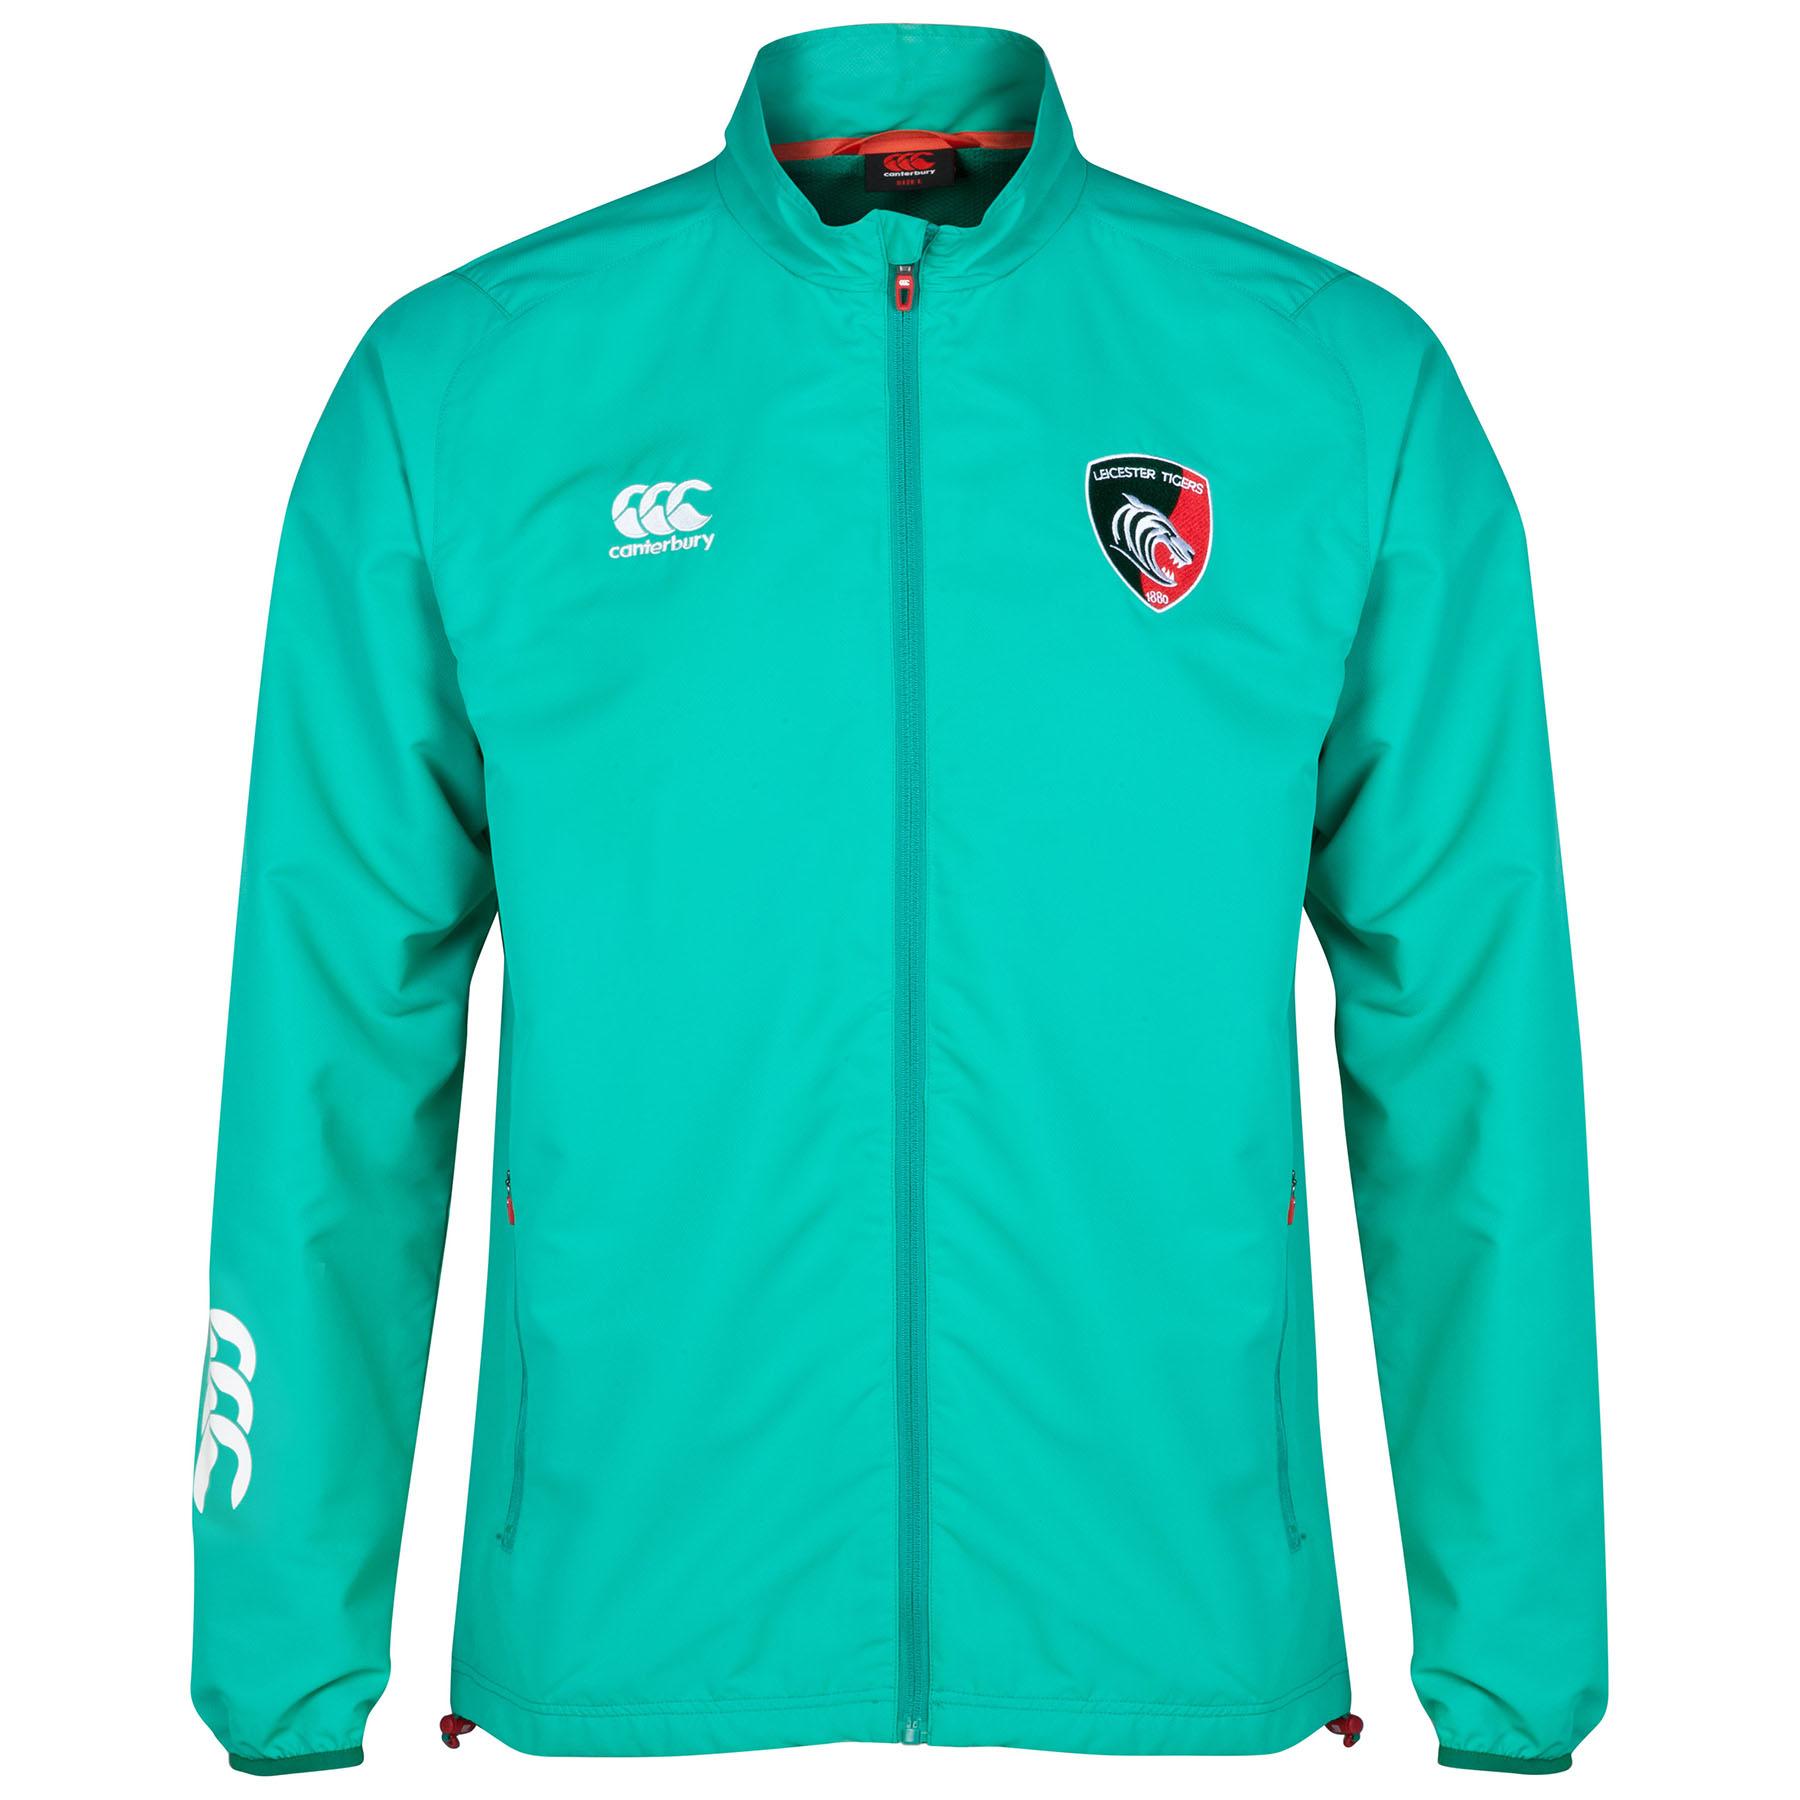 Leicester Tigers Presentation Jacket Dk Green